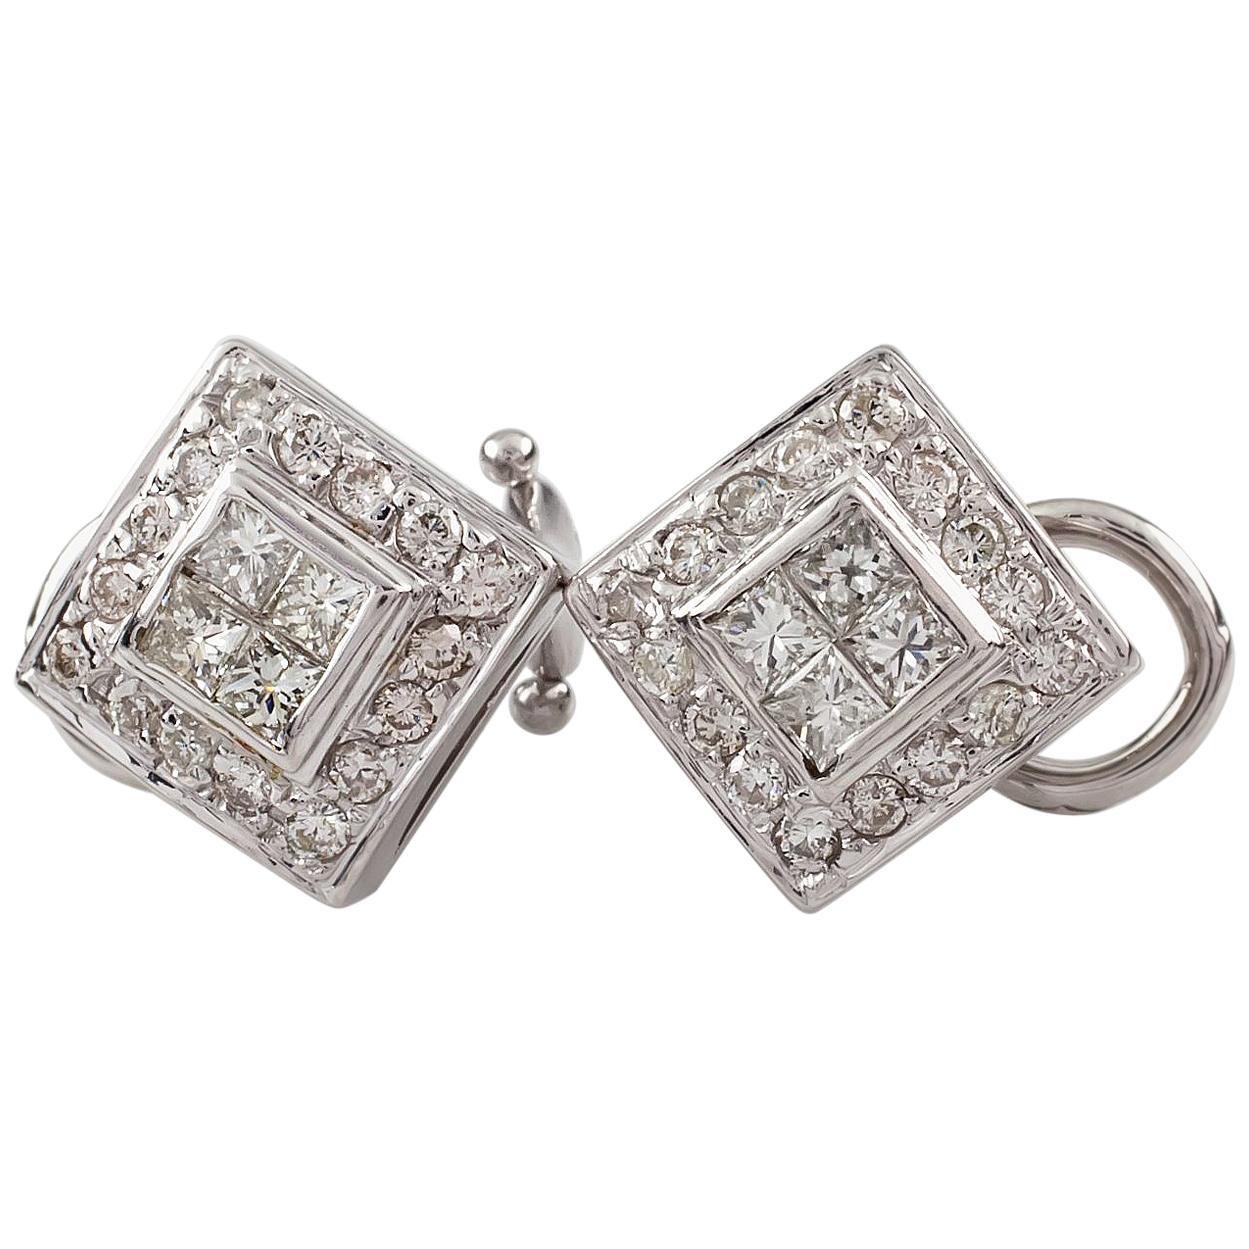 0.85 Carat Multirow Diamond Earrings